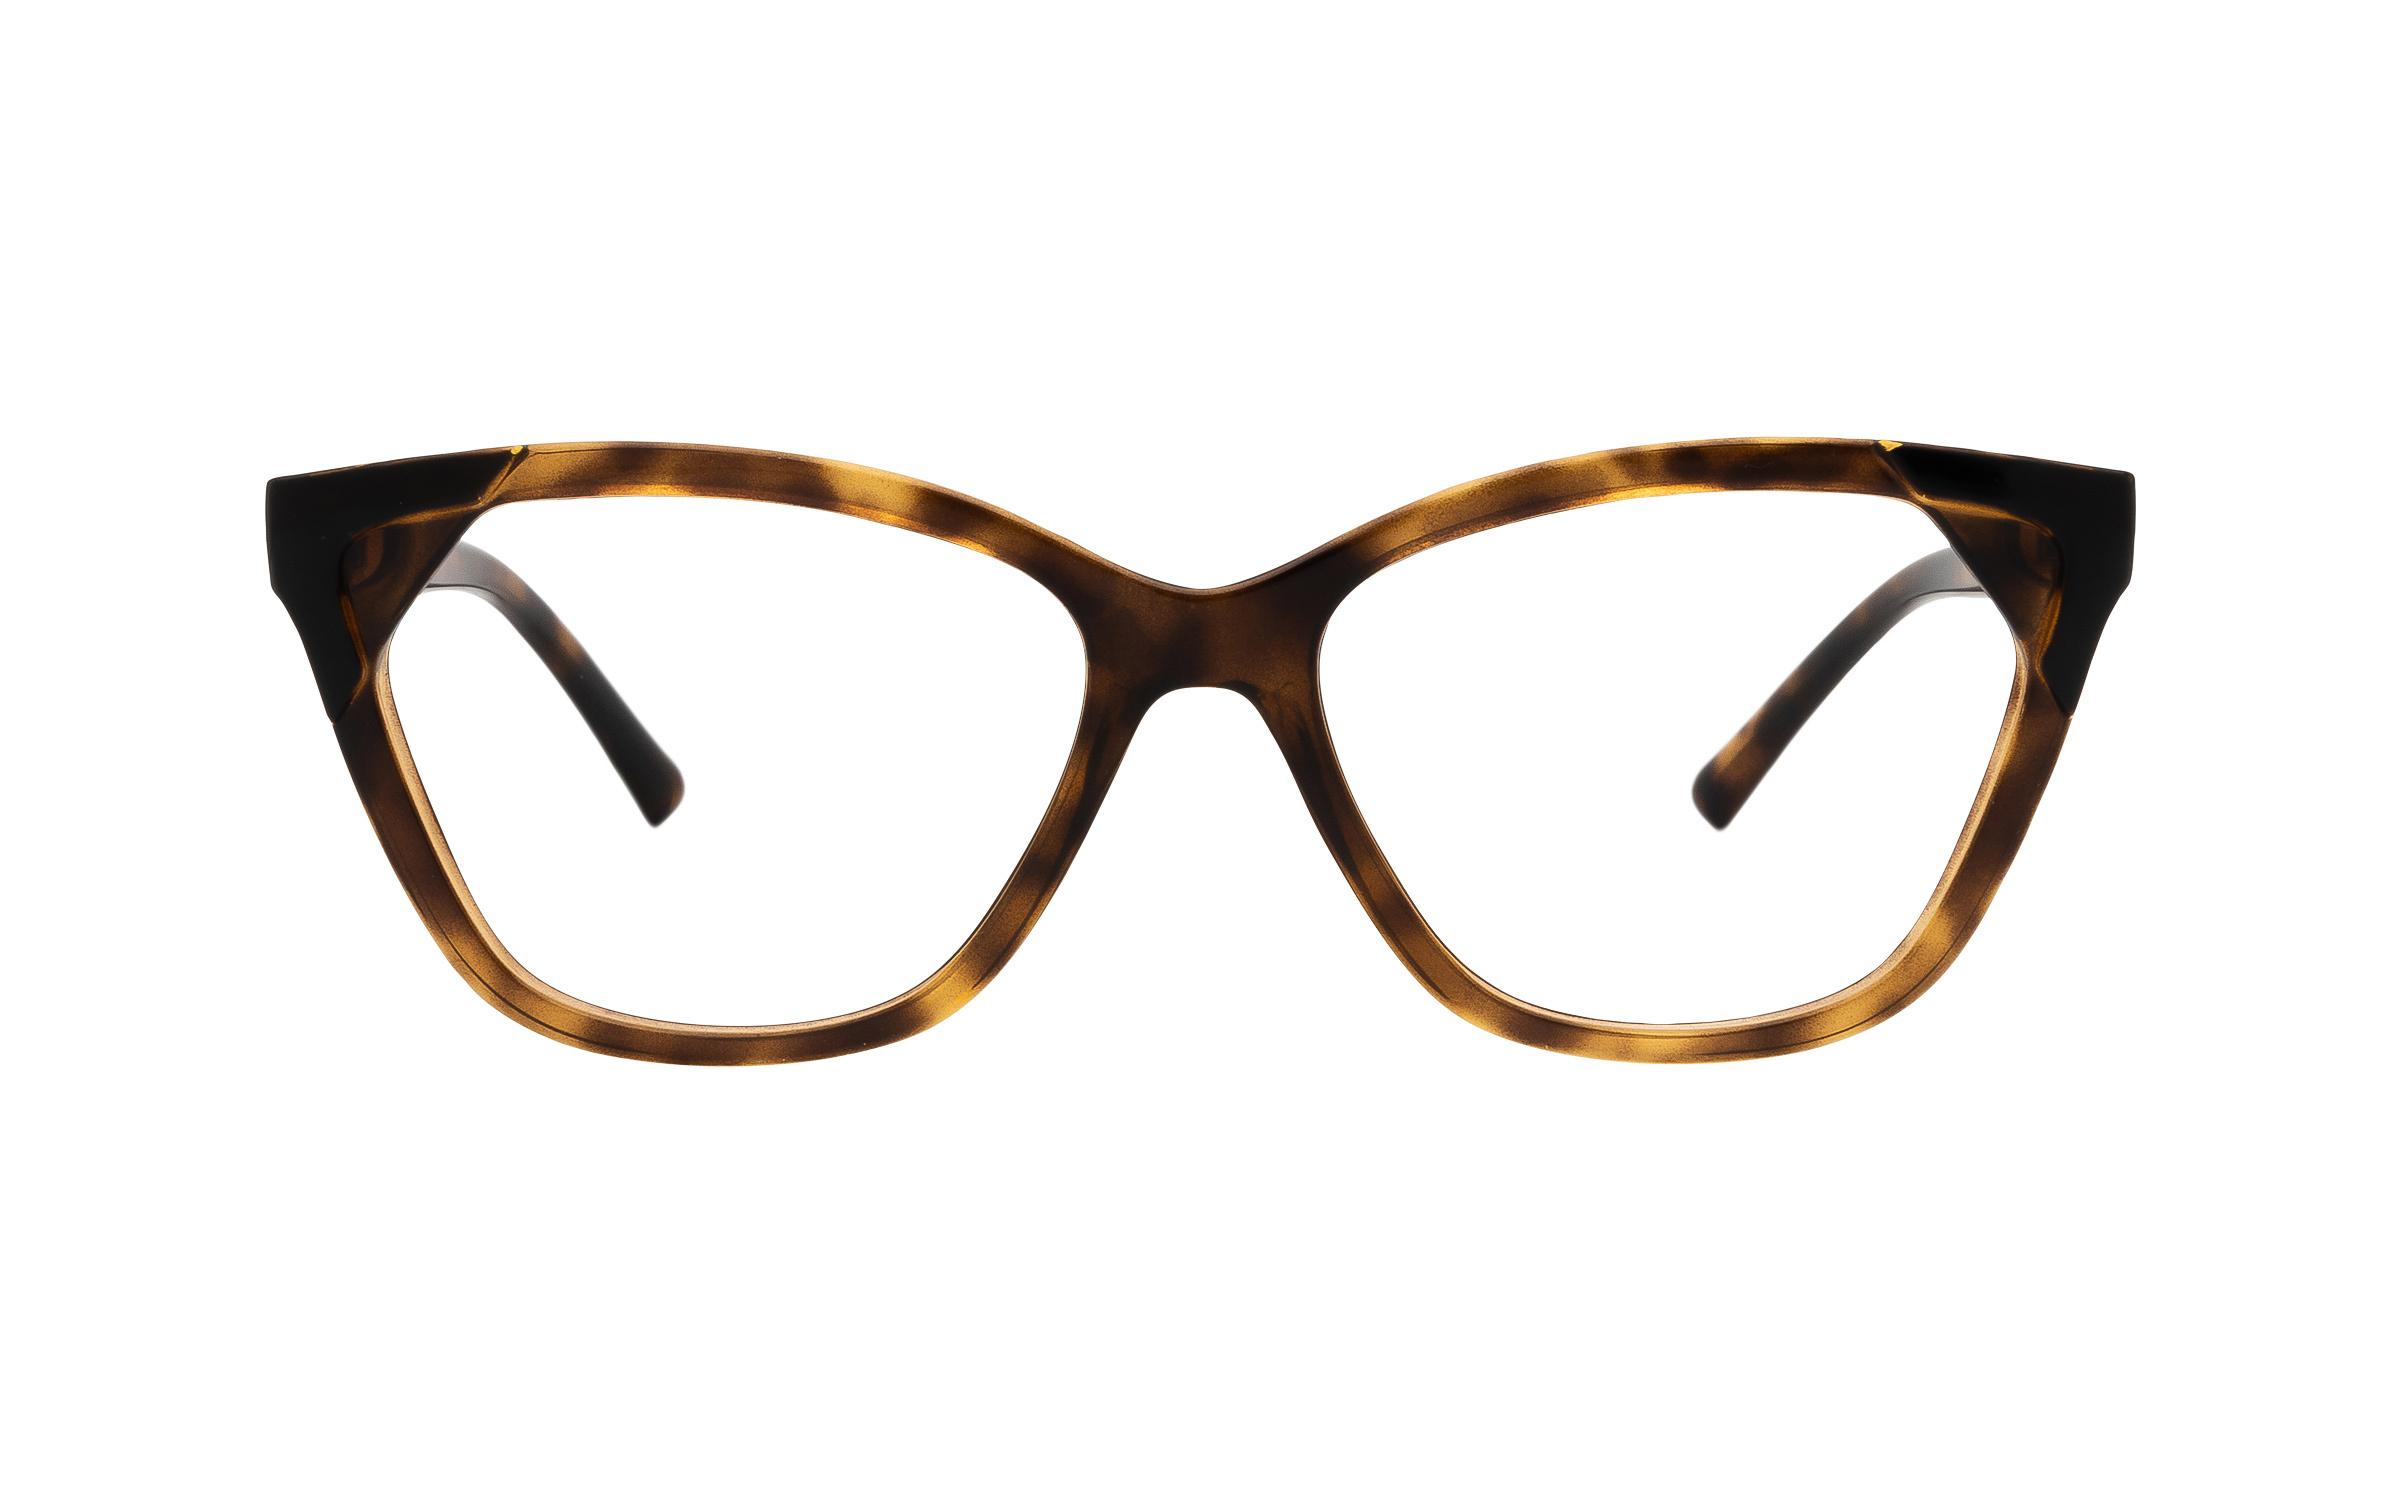 Armani Exchange AX3059 8224 (54) Eyeglasses and Frame in Shiny Havana Tortoise/Brown | Acetate - Online Coastal